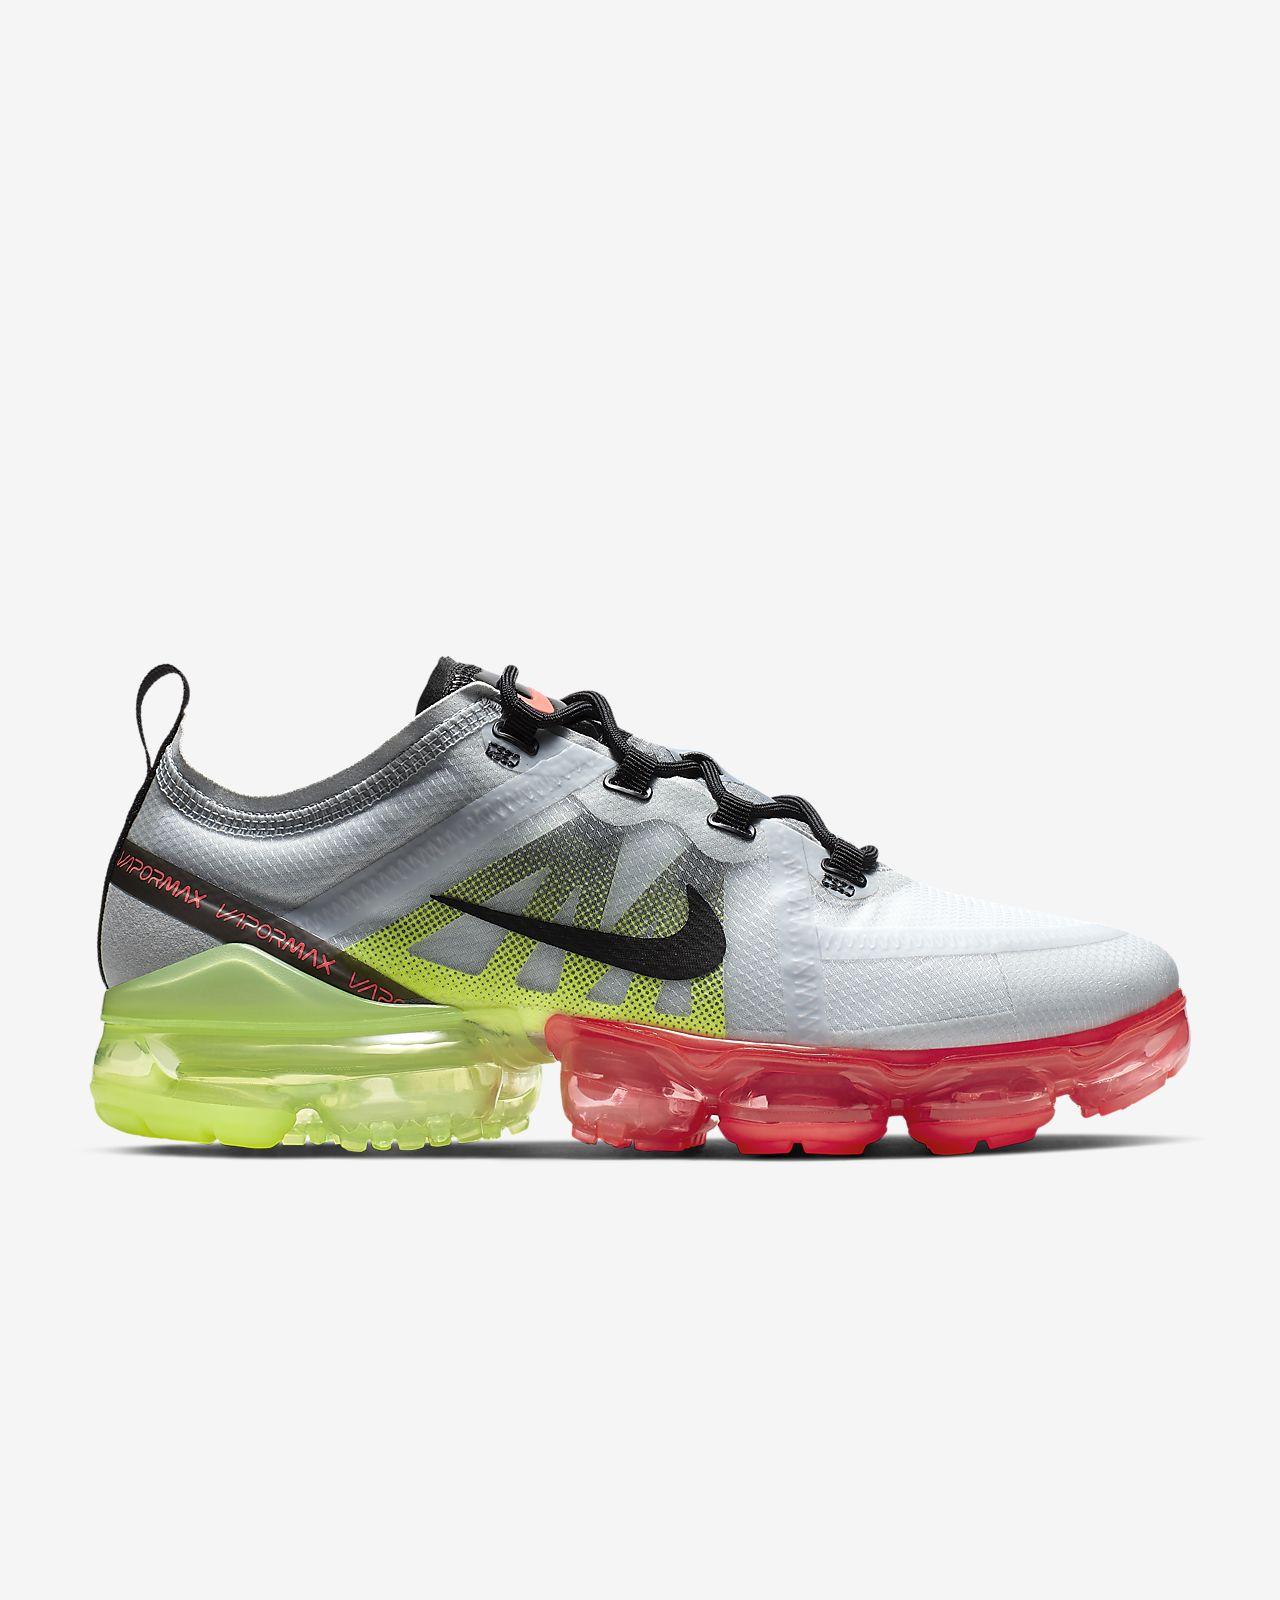 ad819660b3 Nike Air VaporMax 2019 Shoe. Nike.com AU